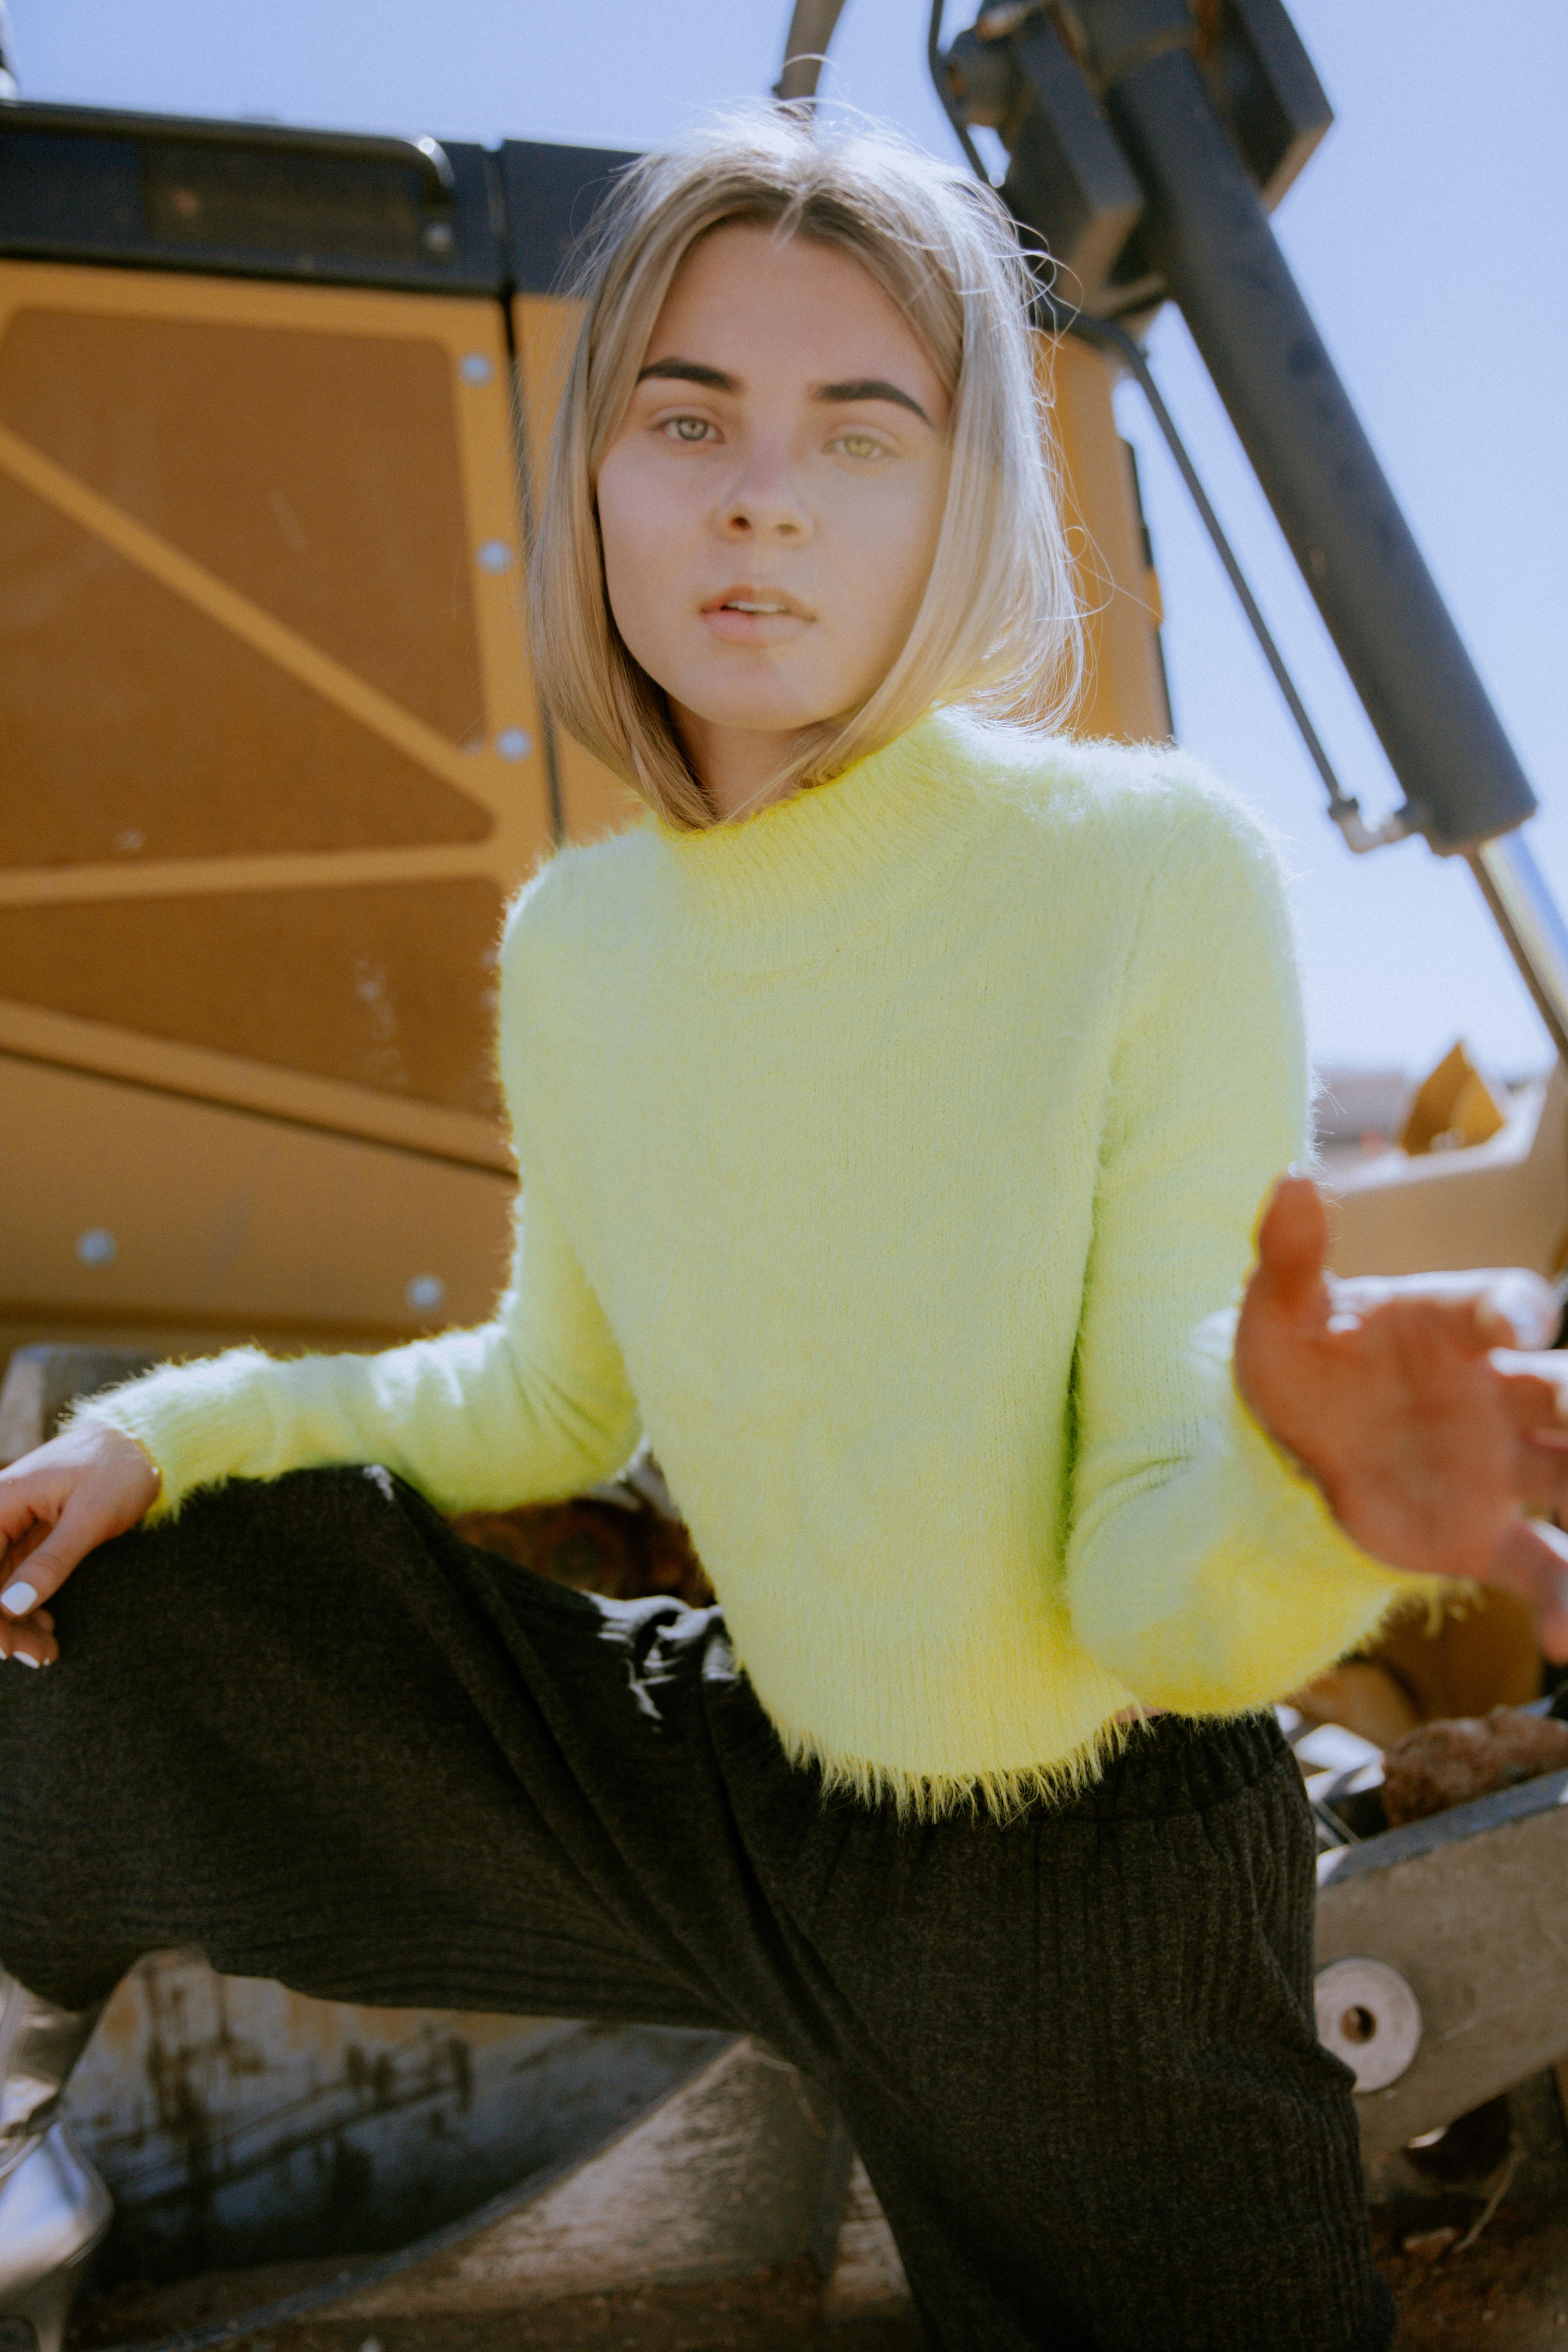 woman standing on yellow heavy equipment